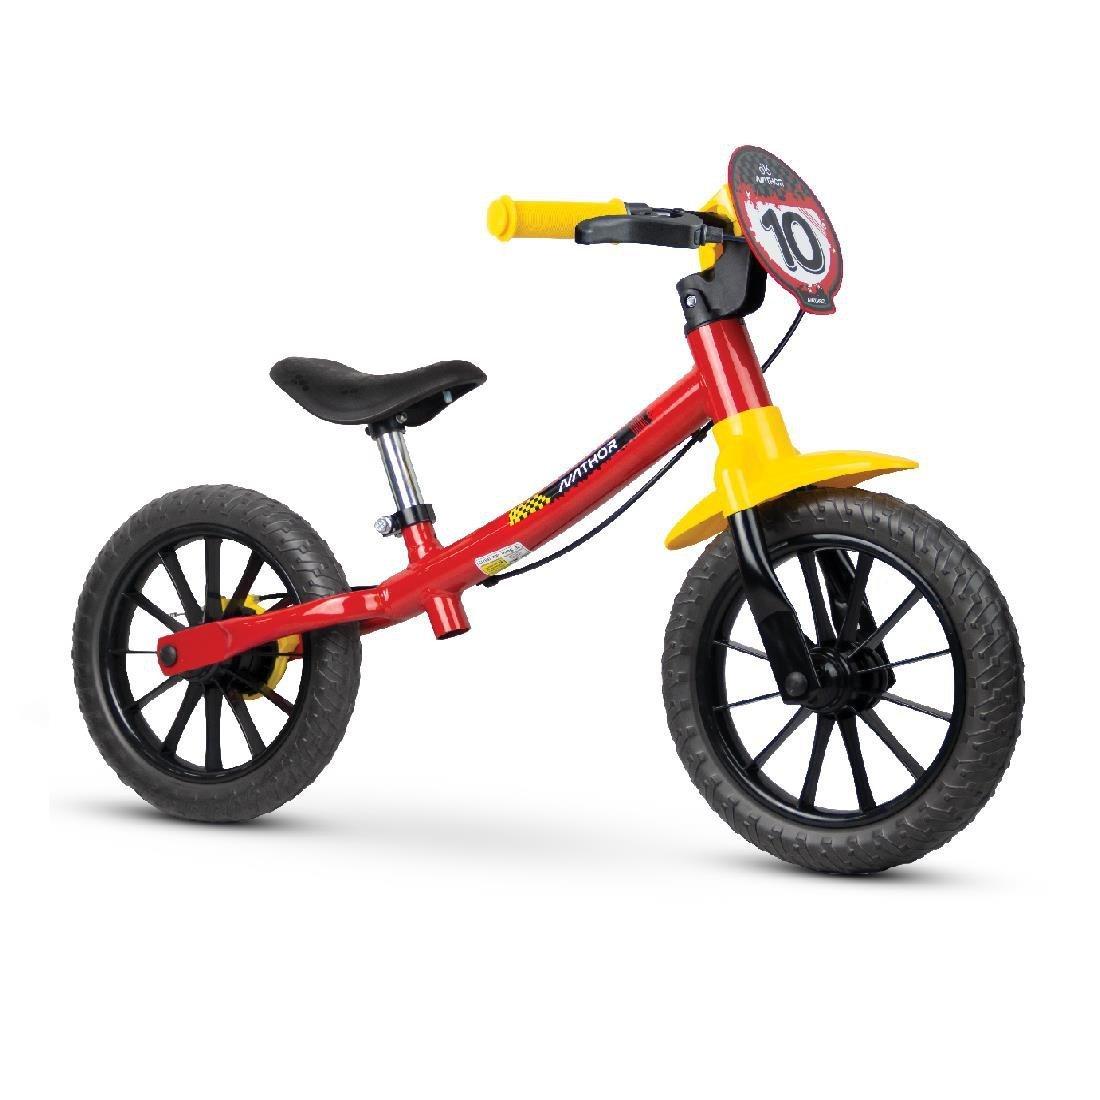 Bicicleta Infantil de Equilibrio Nathor Fast